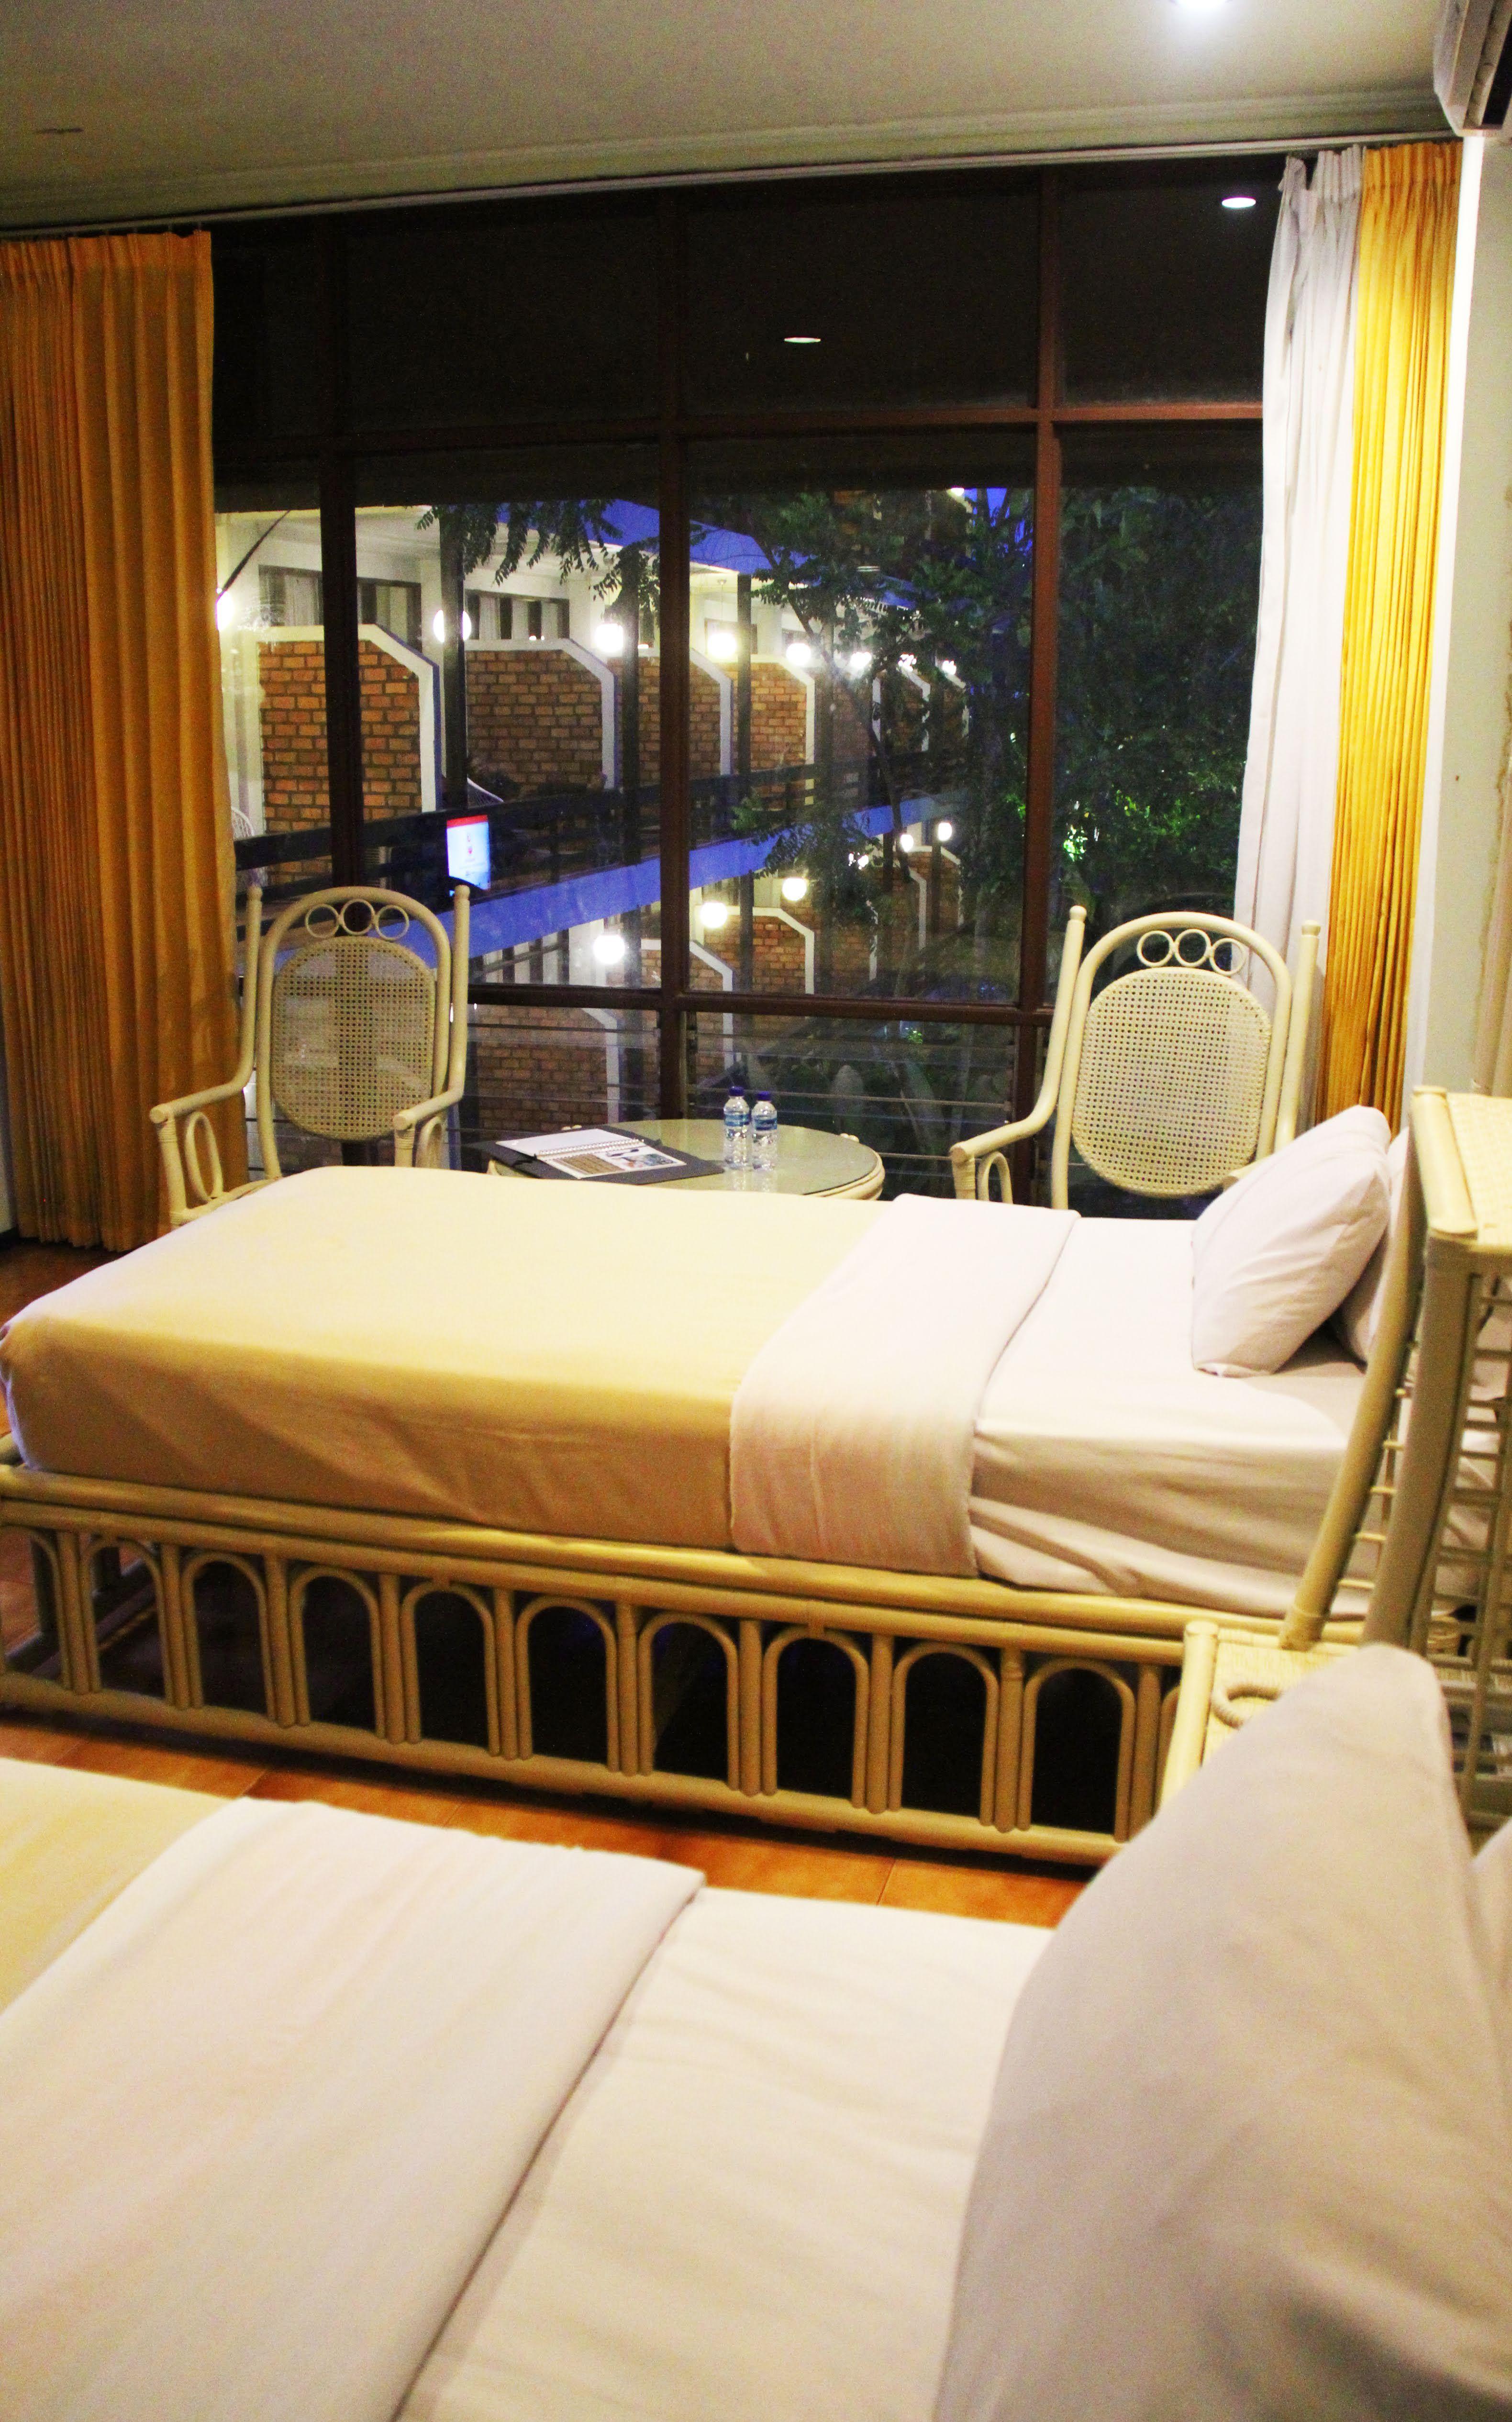 Mesra Alamanda Hotel, Samarinda